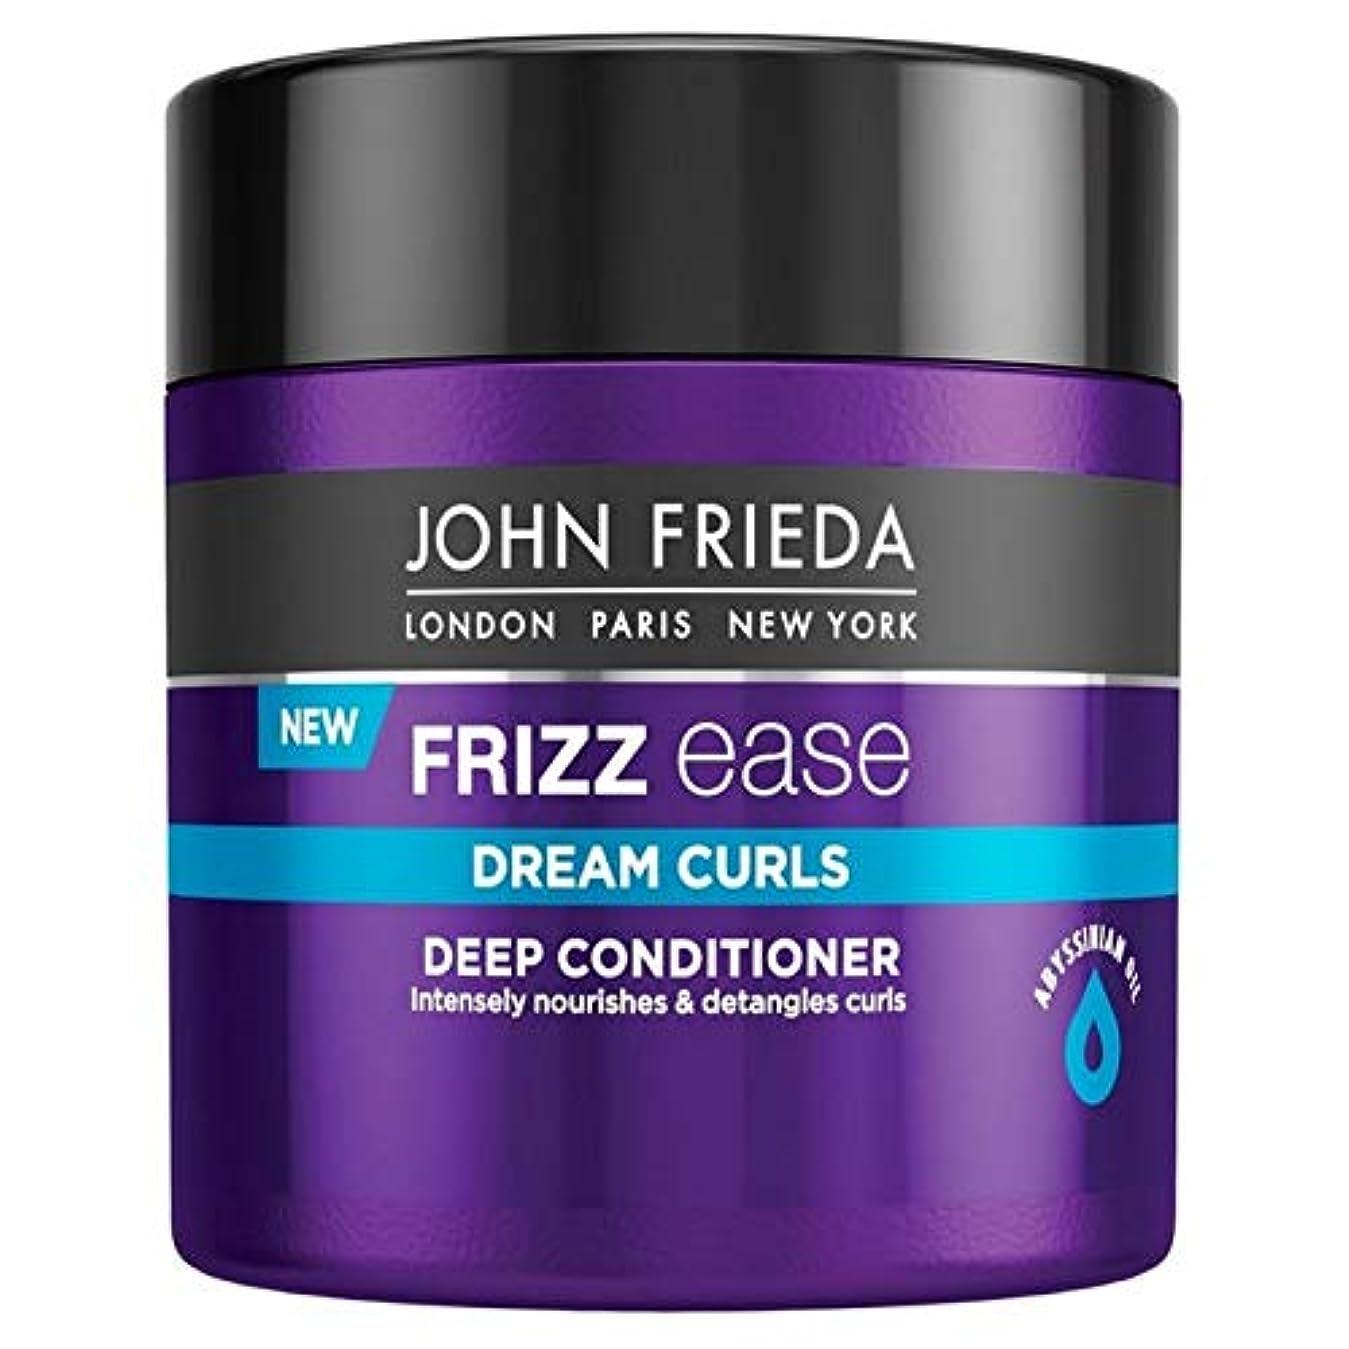 [John Frieda ] ジョン?フリーダ縮れ容易夢カール深いコンディショナー150ミリリットル - John Frieda Frizz Ease Dream Curls Deep Conditioner 150ml...